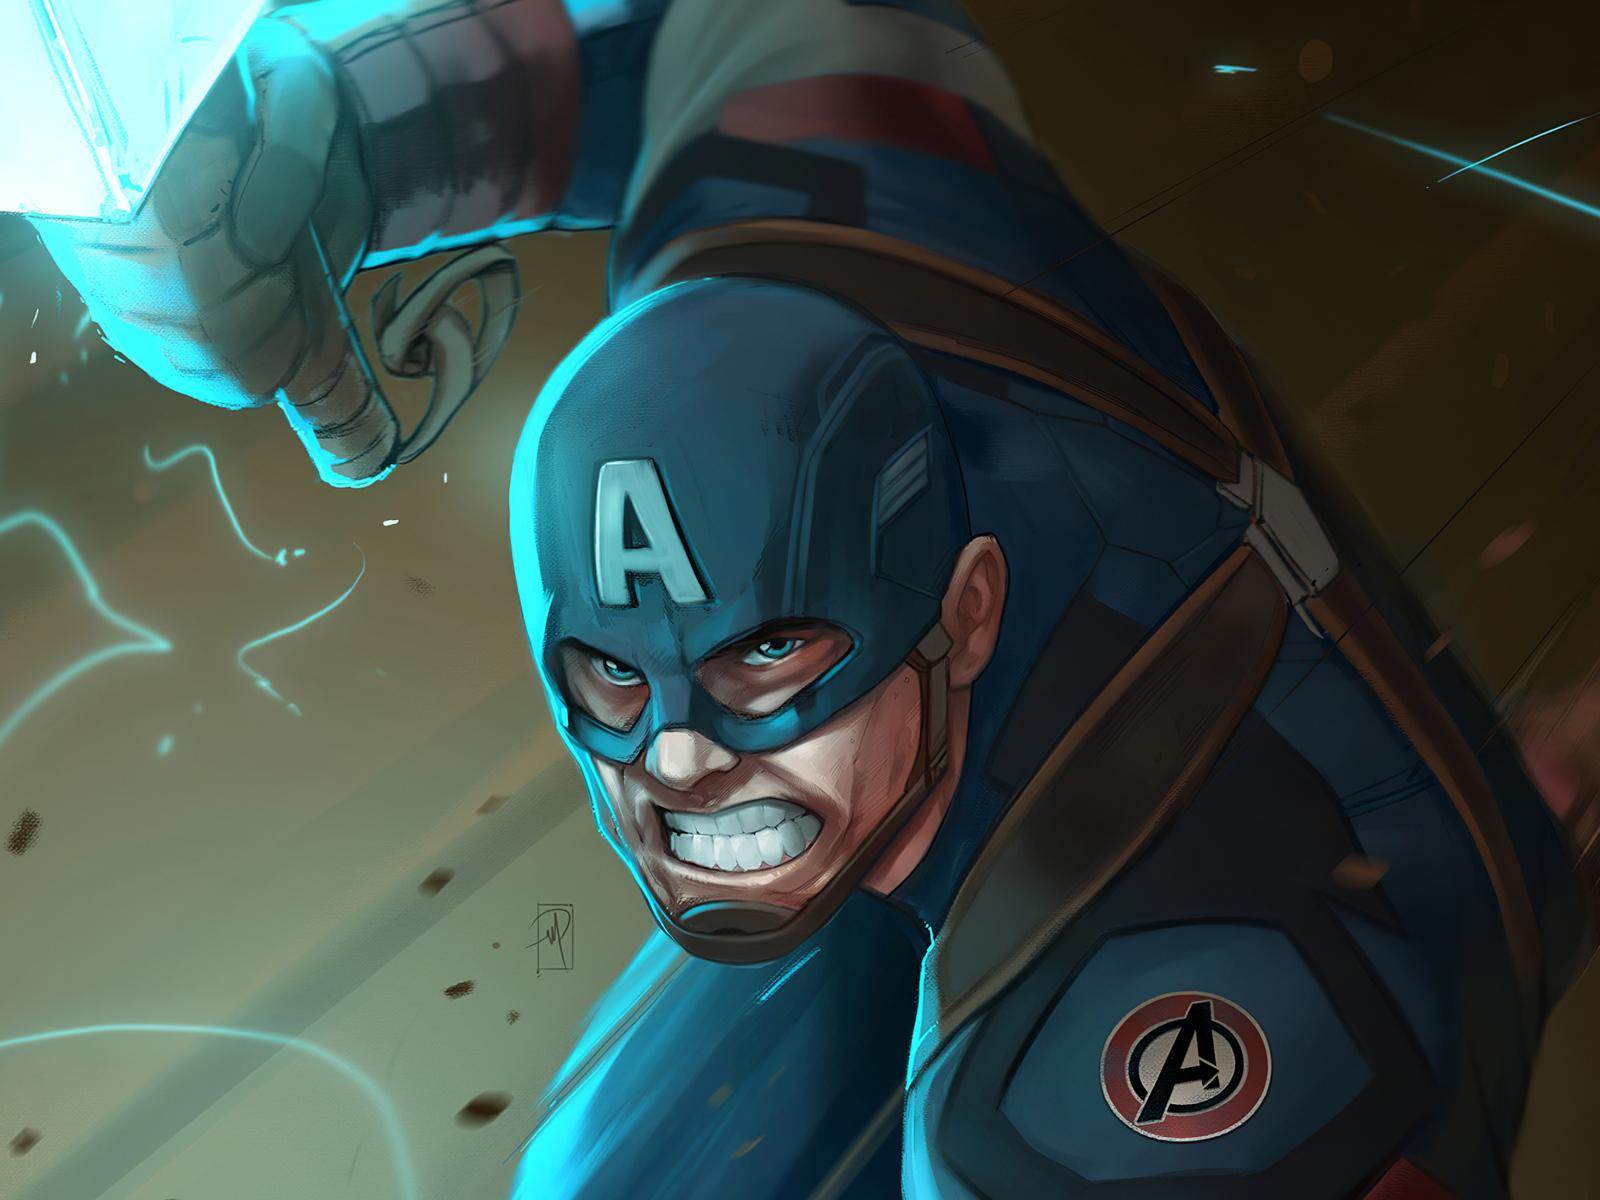 captain-america-hammer4k-7u.jpg